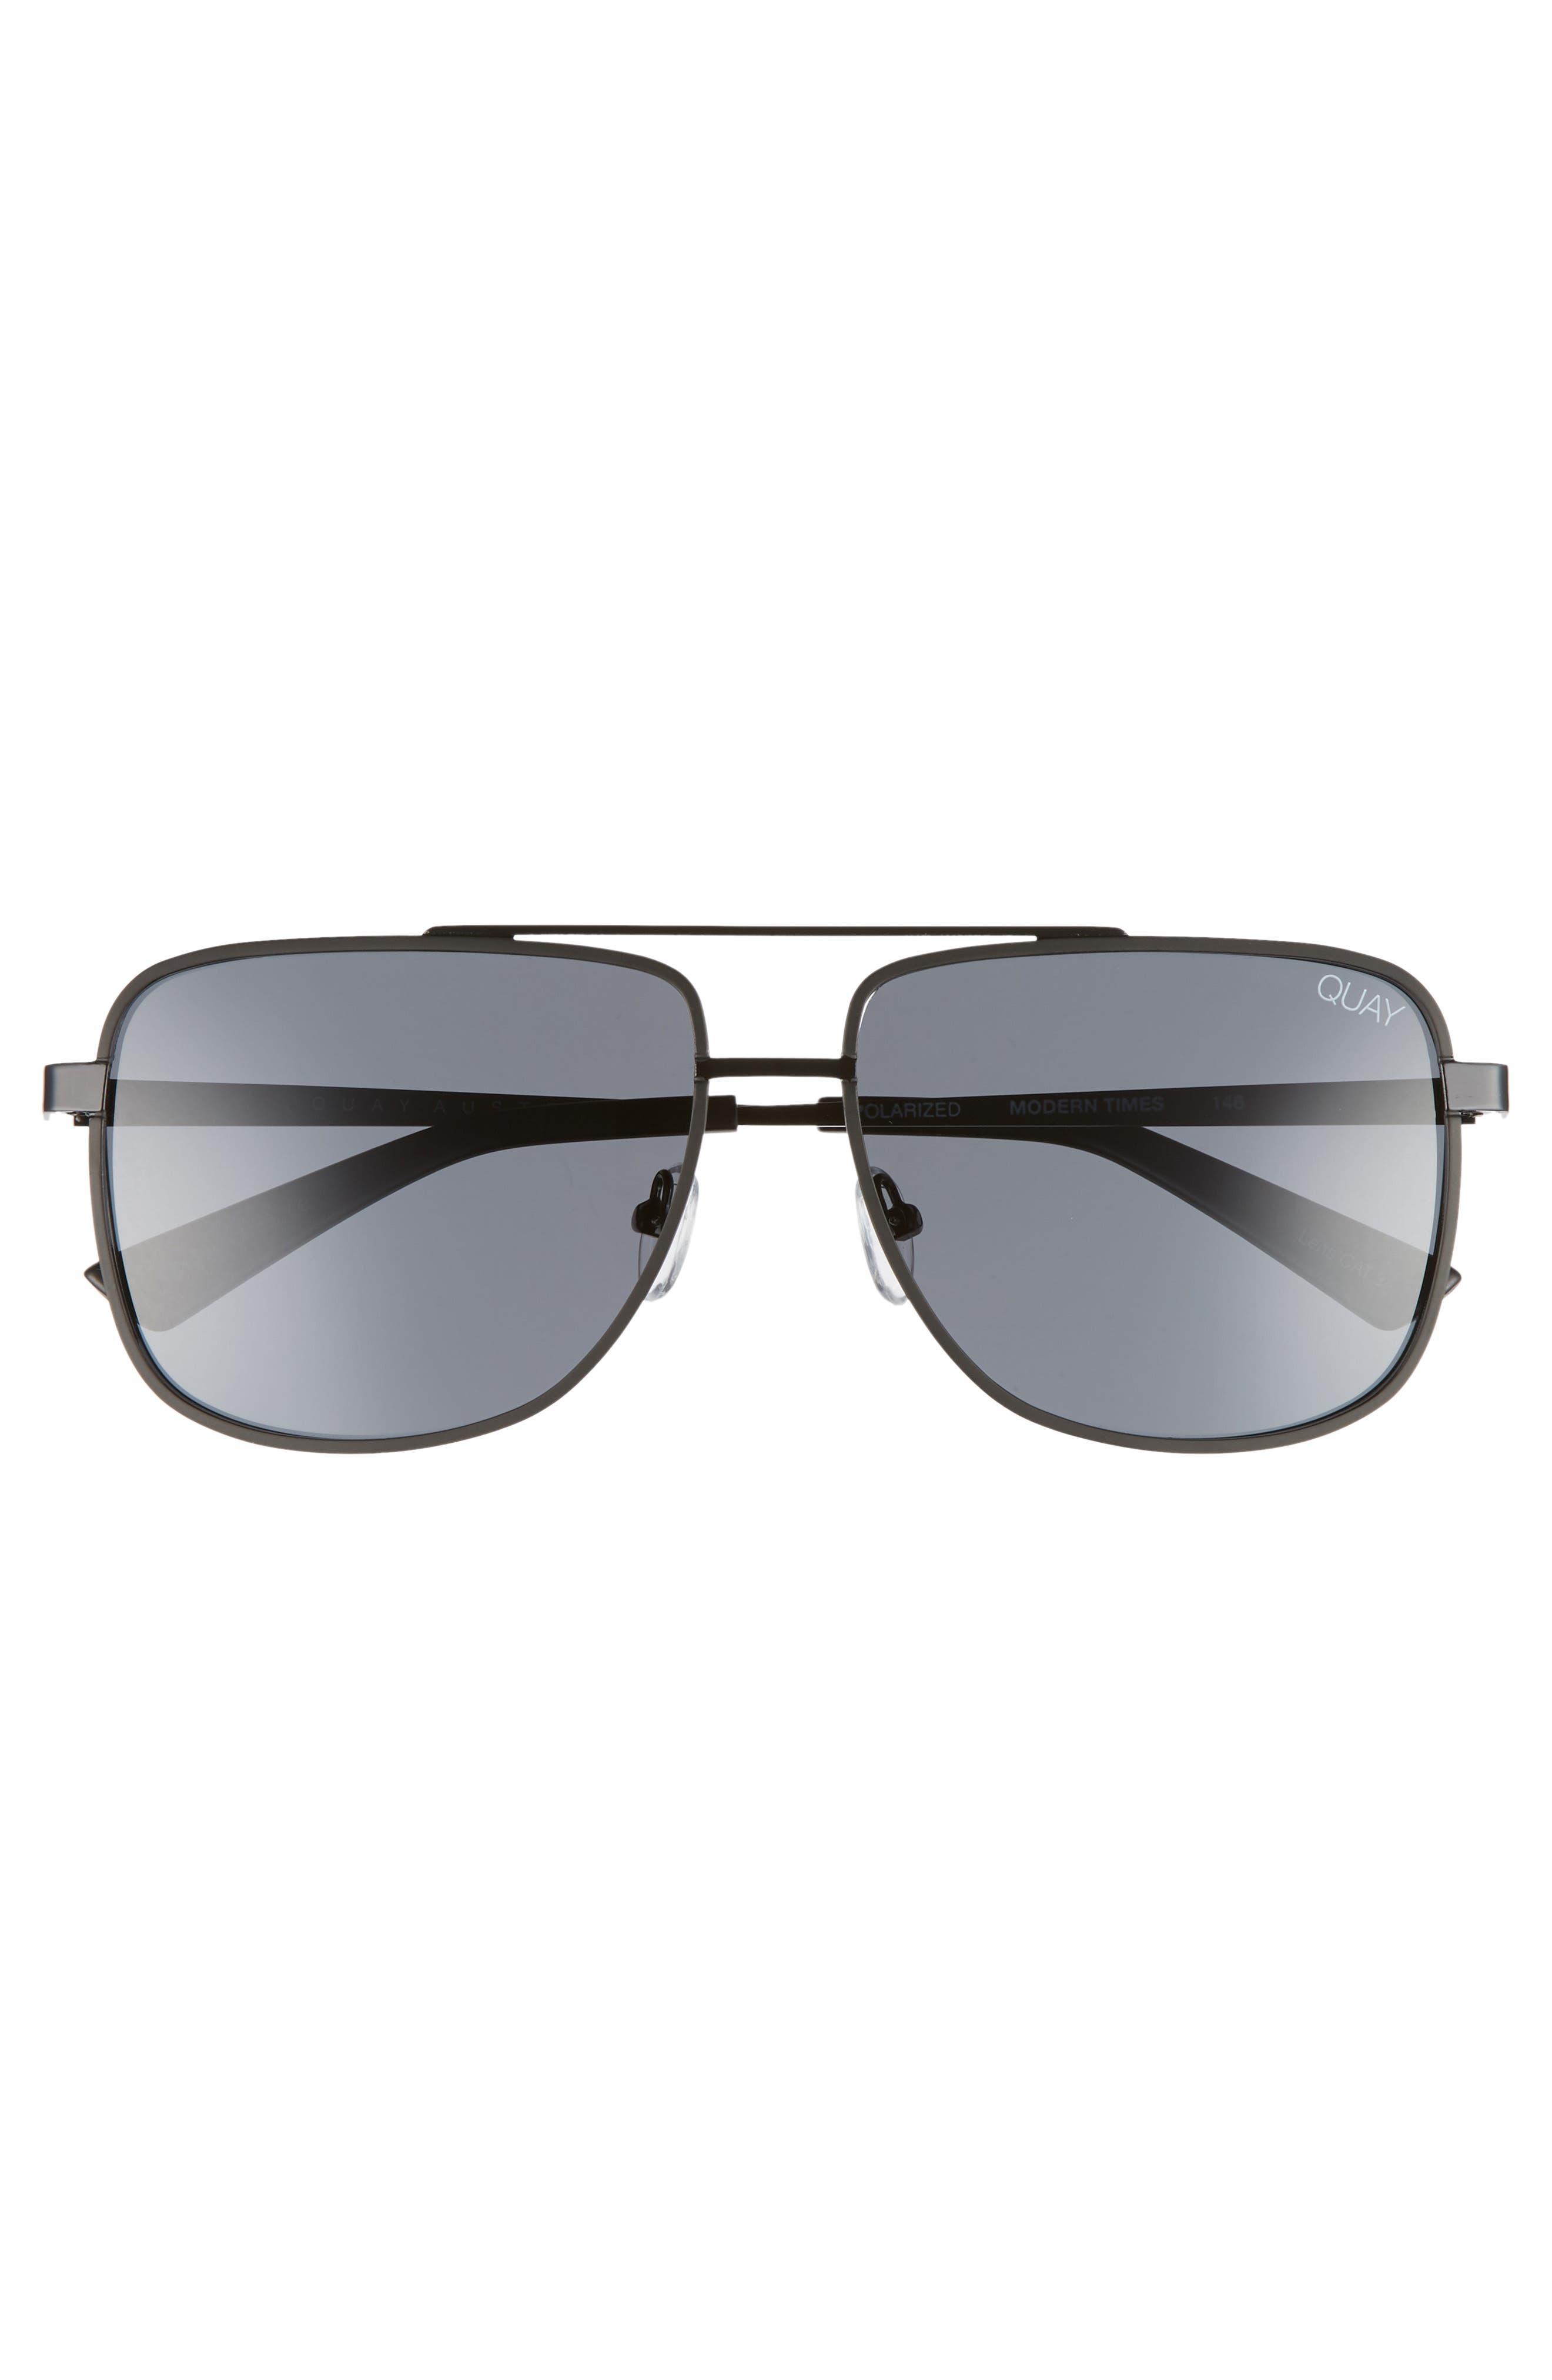 Modern Times 57mm Polarized Aviator Sunglasses,                             Alternate thumbnail 2, color,                             Black / Smoke Lens